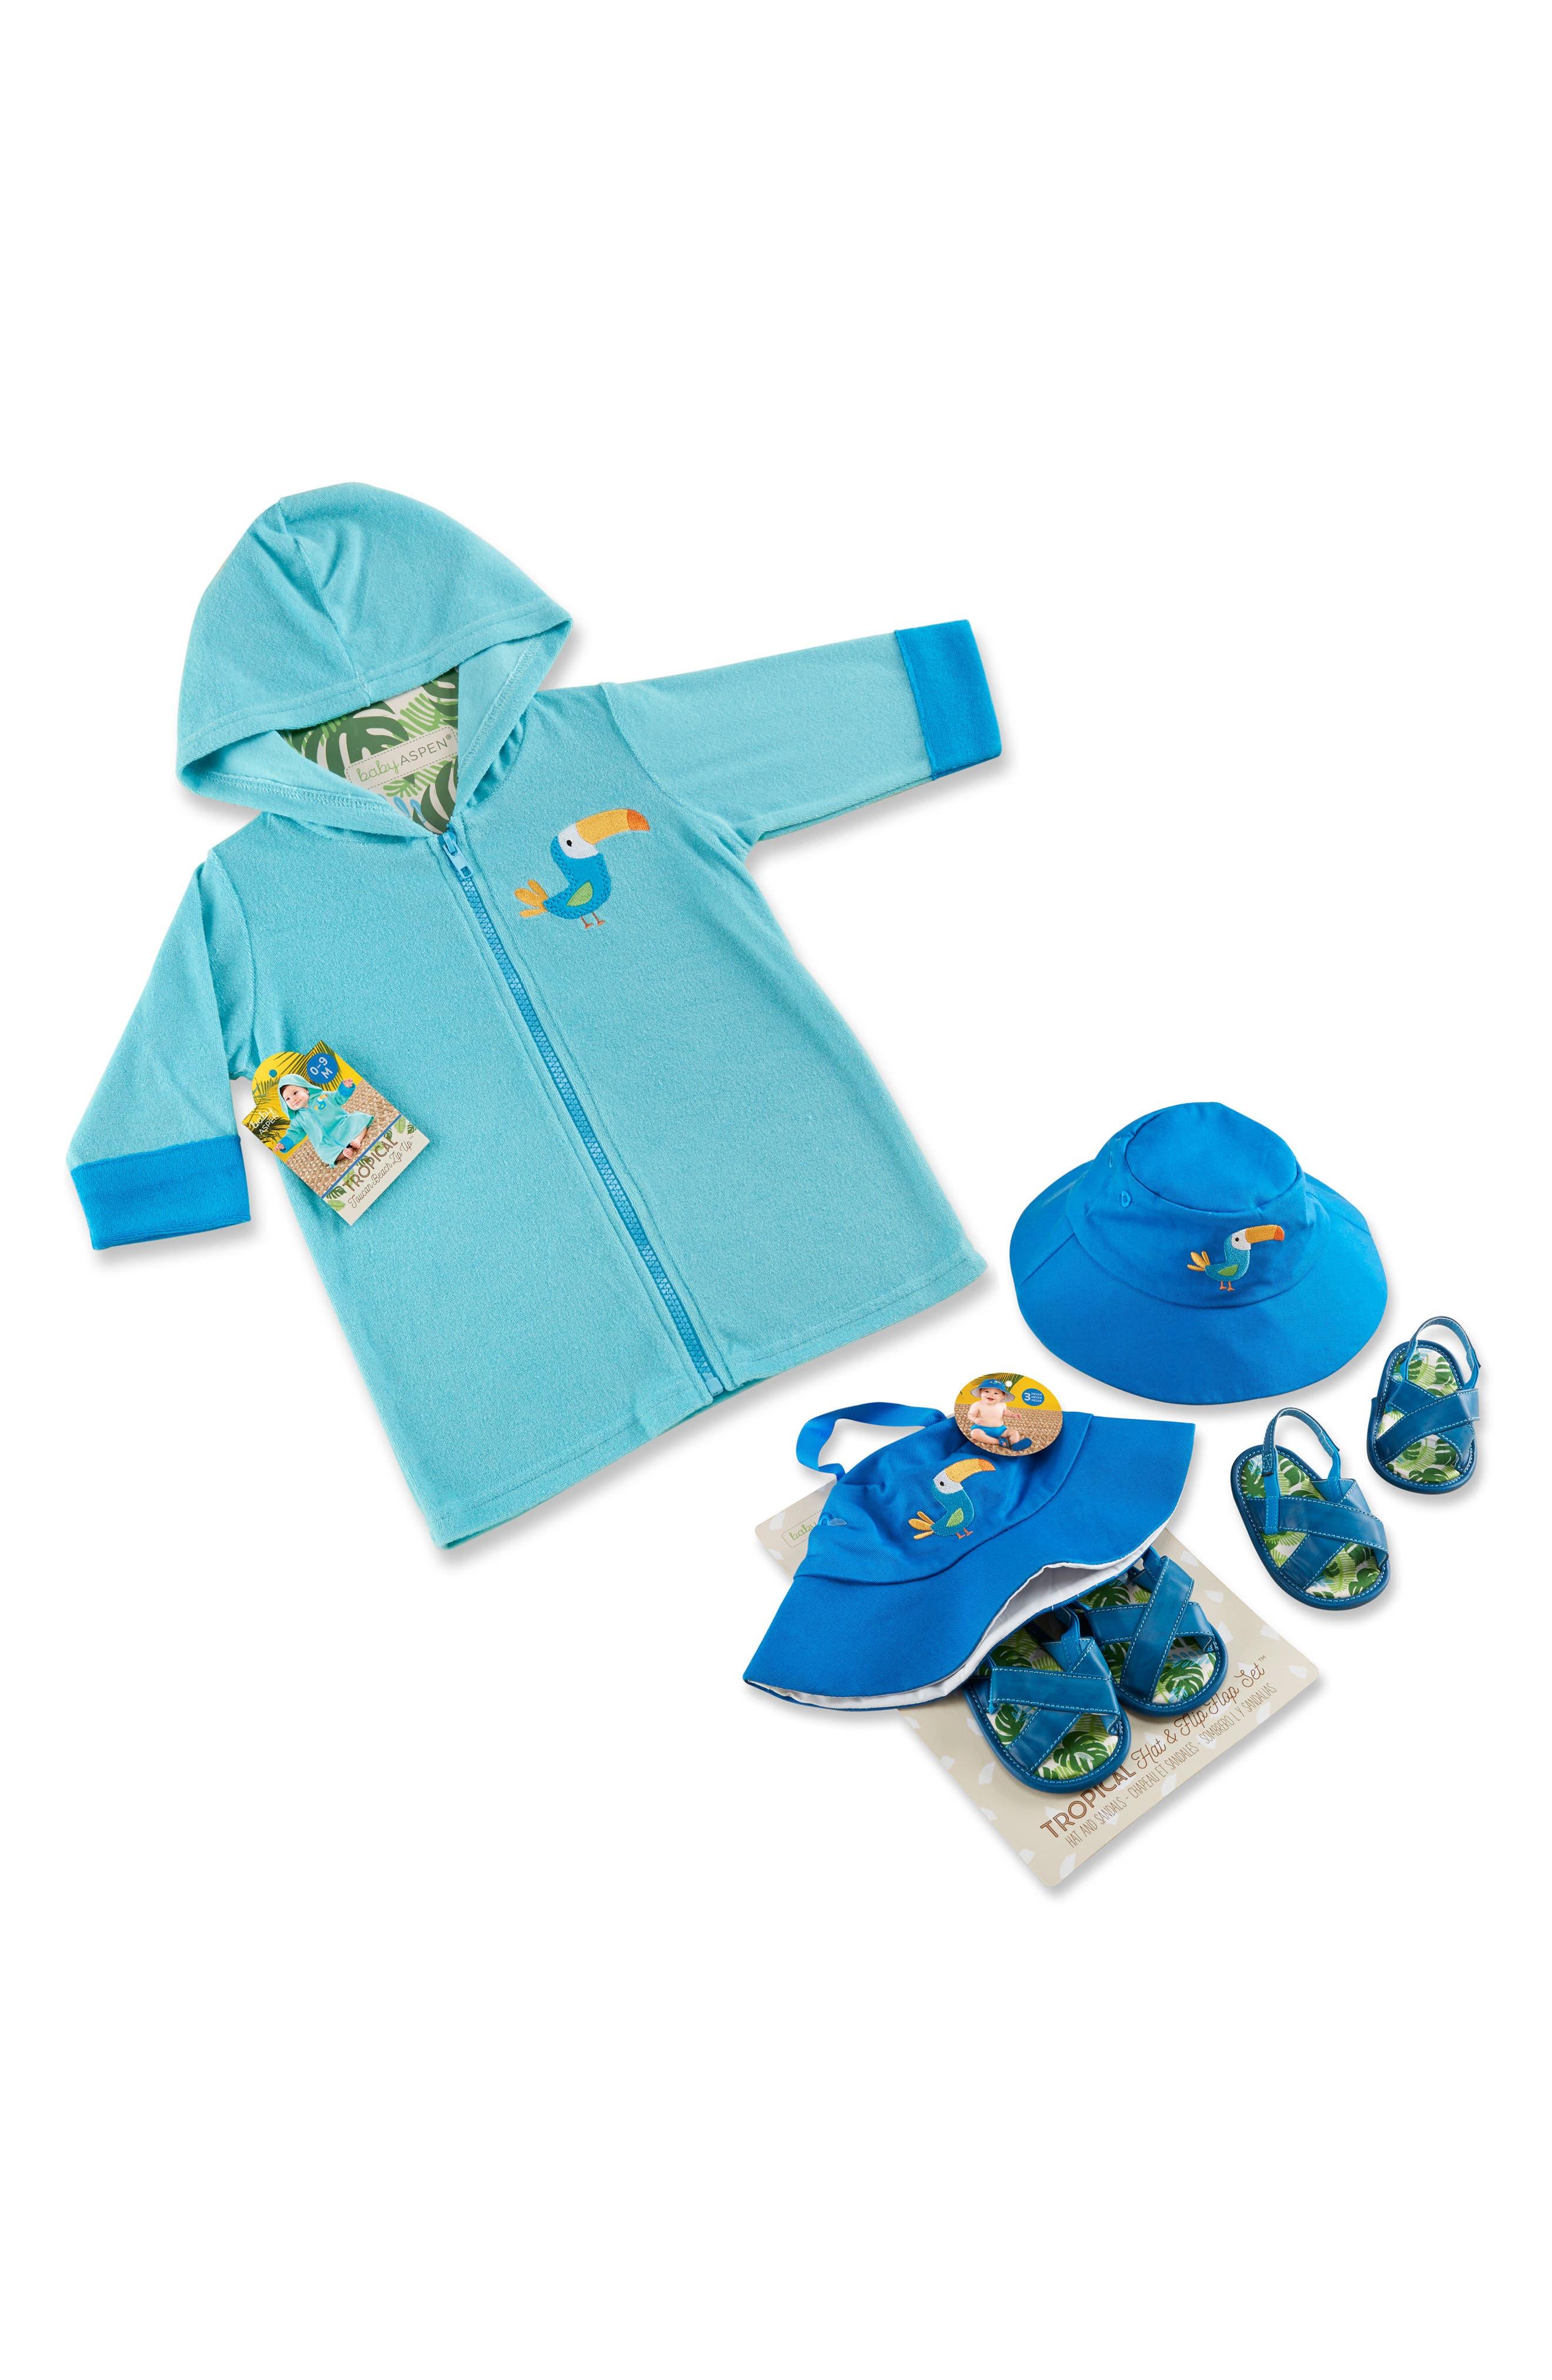 Tropical 3-Piece Gift Set,                         Main,                         color, Blue